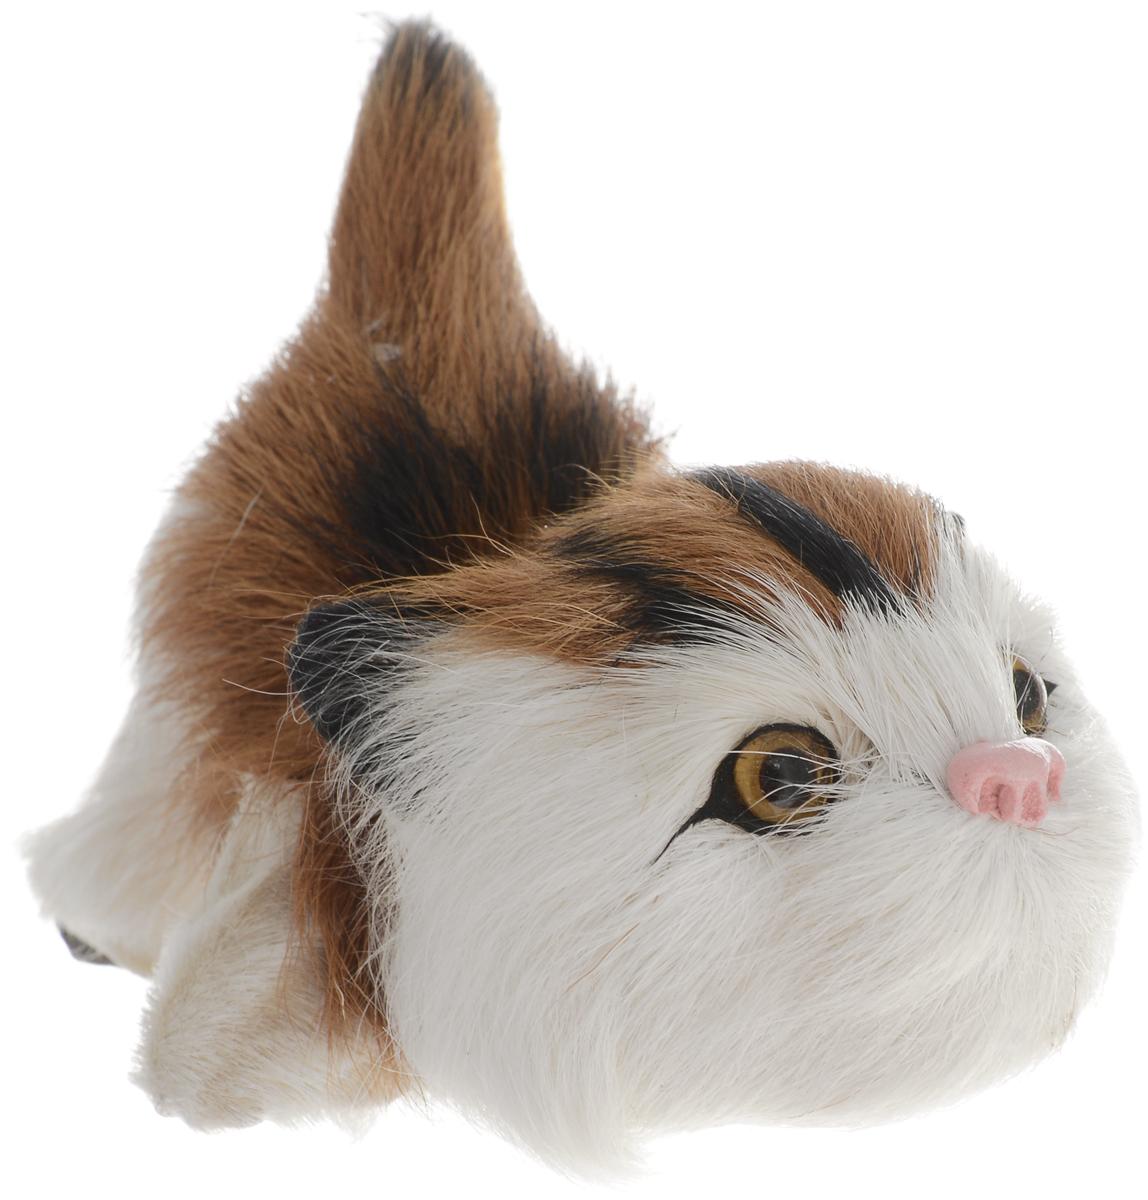 Vebtoy Фигурка Котенок играющий цвет коричневый vebtoy фигурка котенок сидящий цвет белый c226